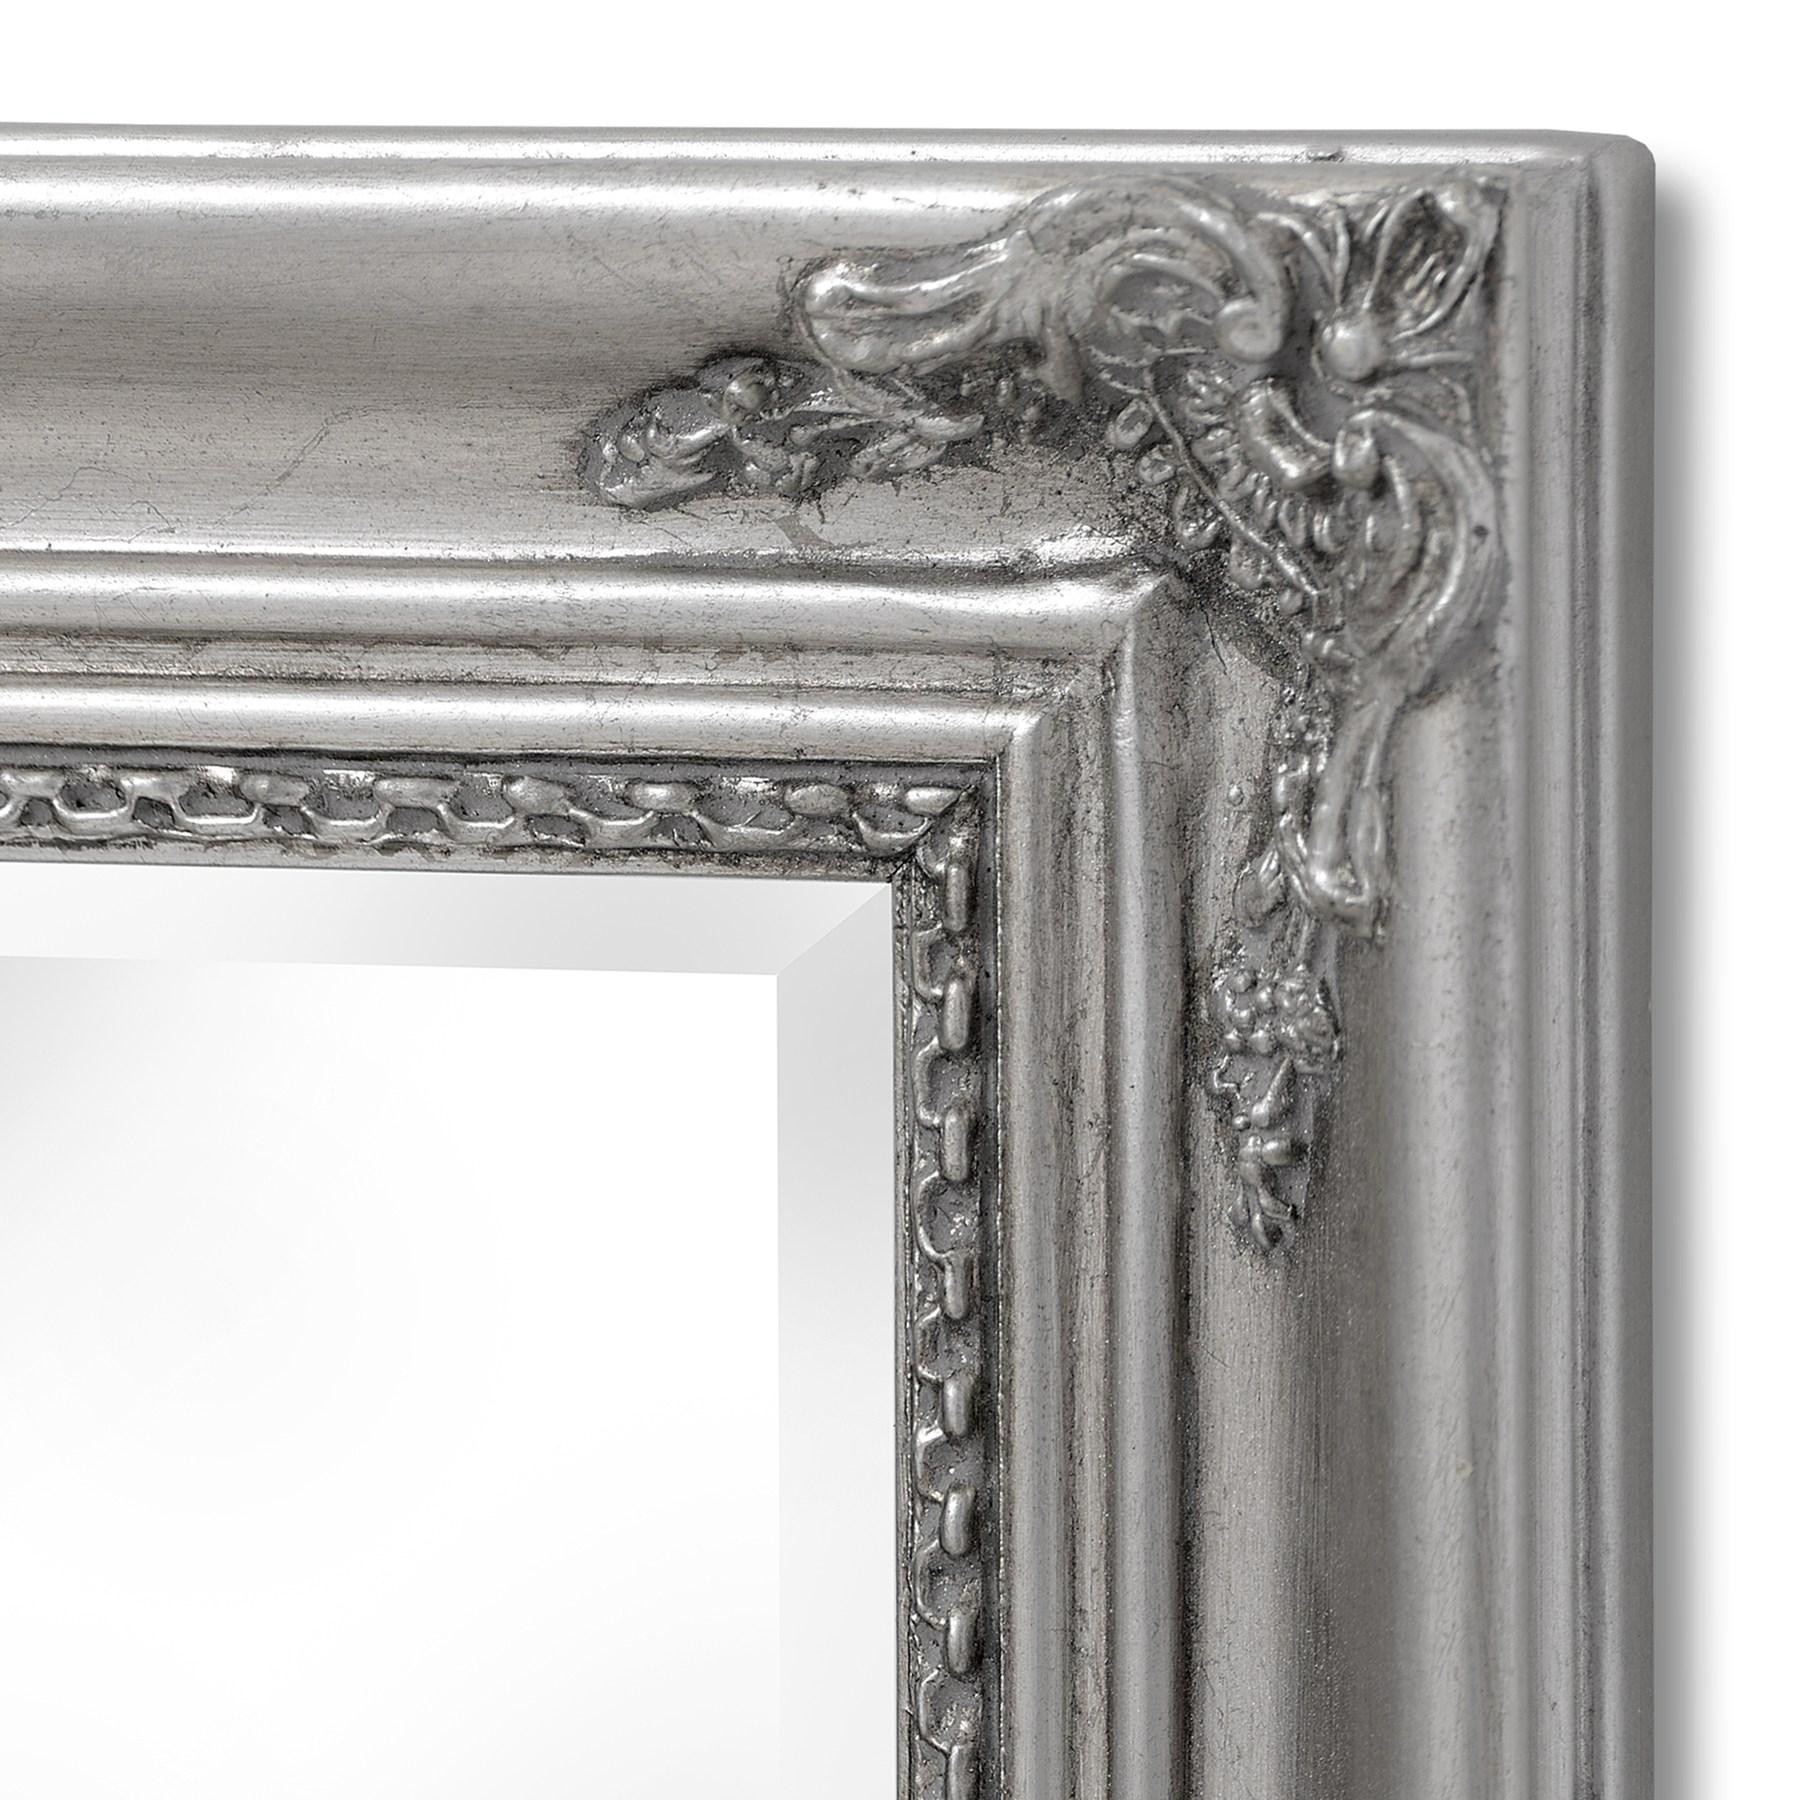 Baroque Slimline Antique Silver Full Length Mirror - Image 2